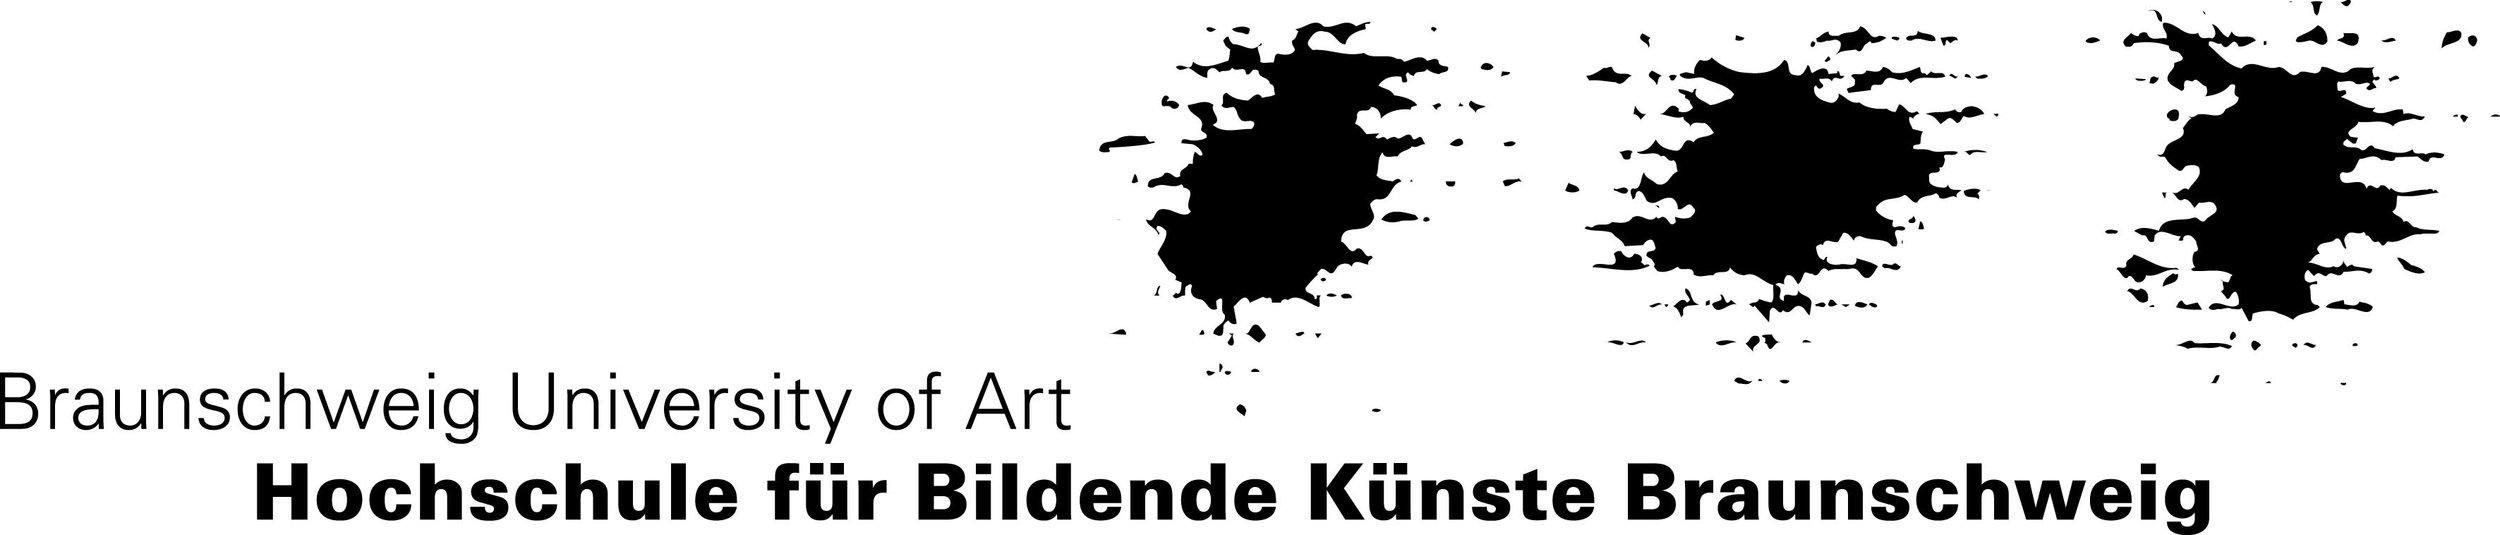 hbk-logo_pfade.jpg